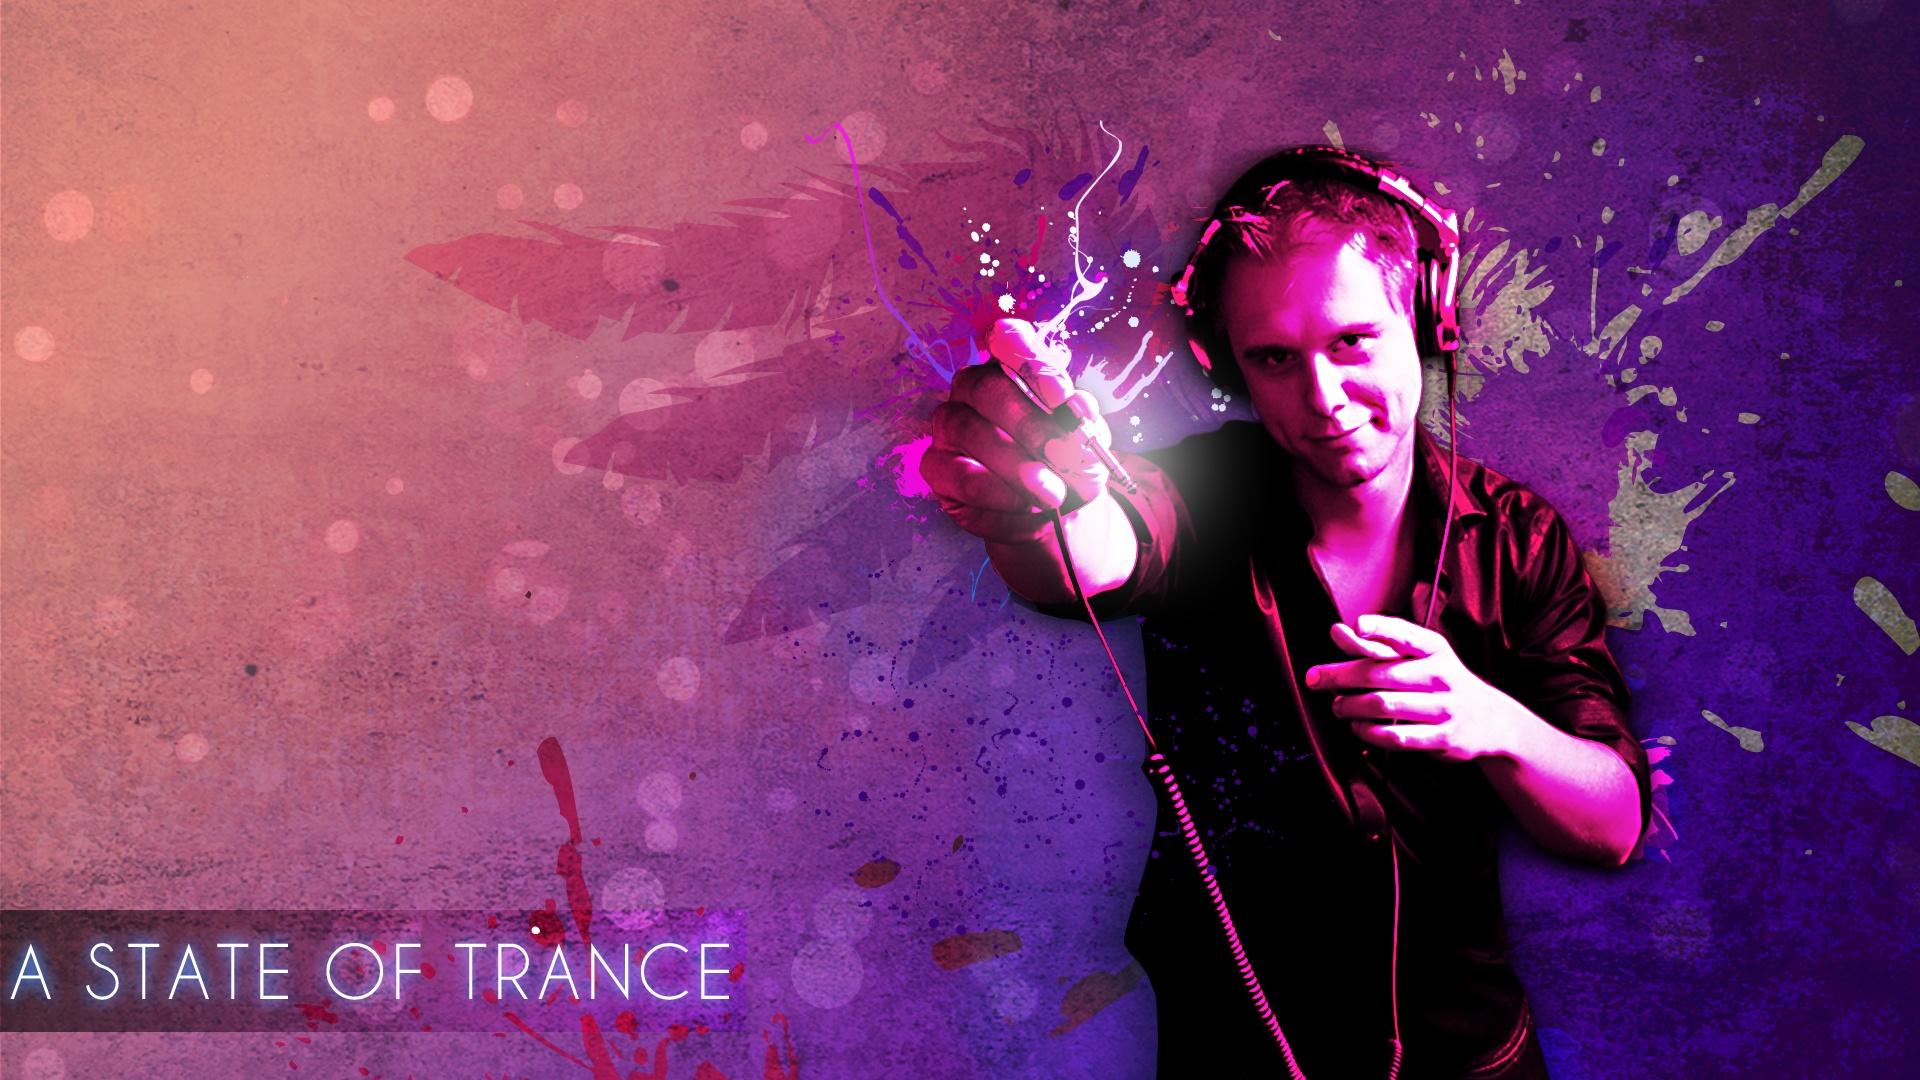 Armin Van Buuren A State Of Trance Hd Wallpaper   HQ Wallpapers 1920x1080